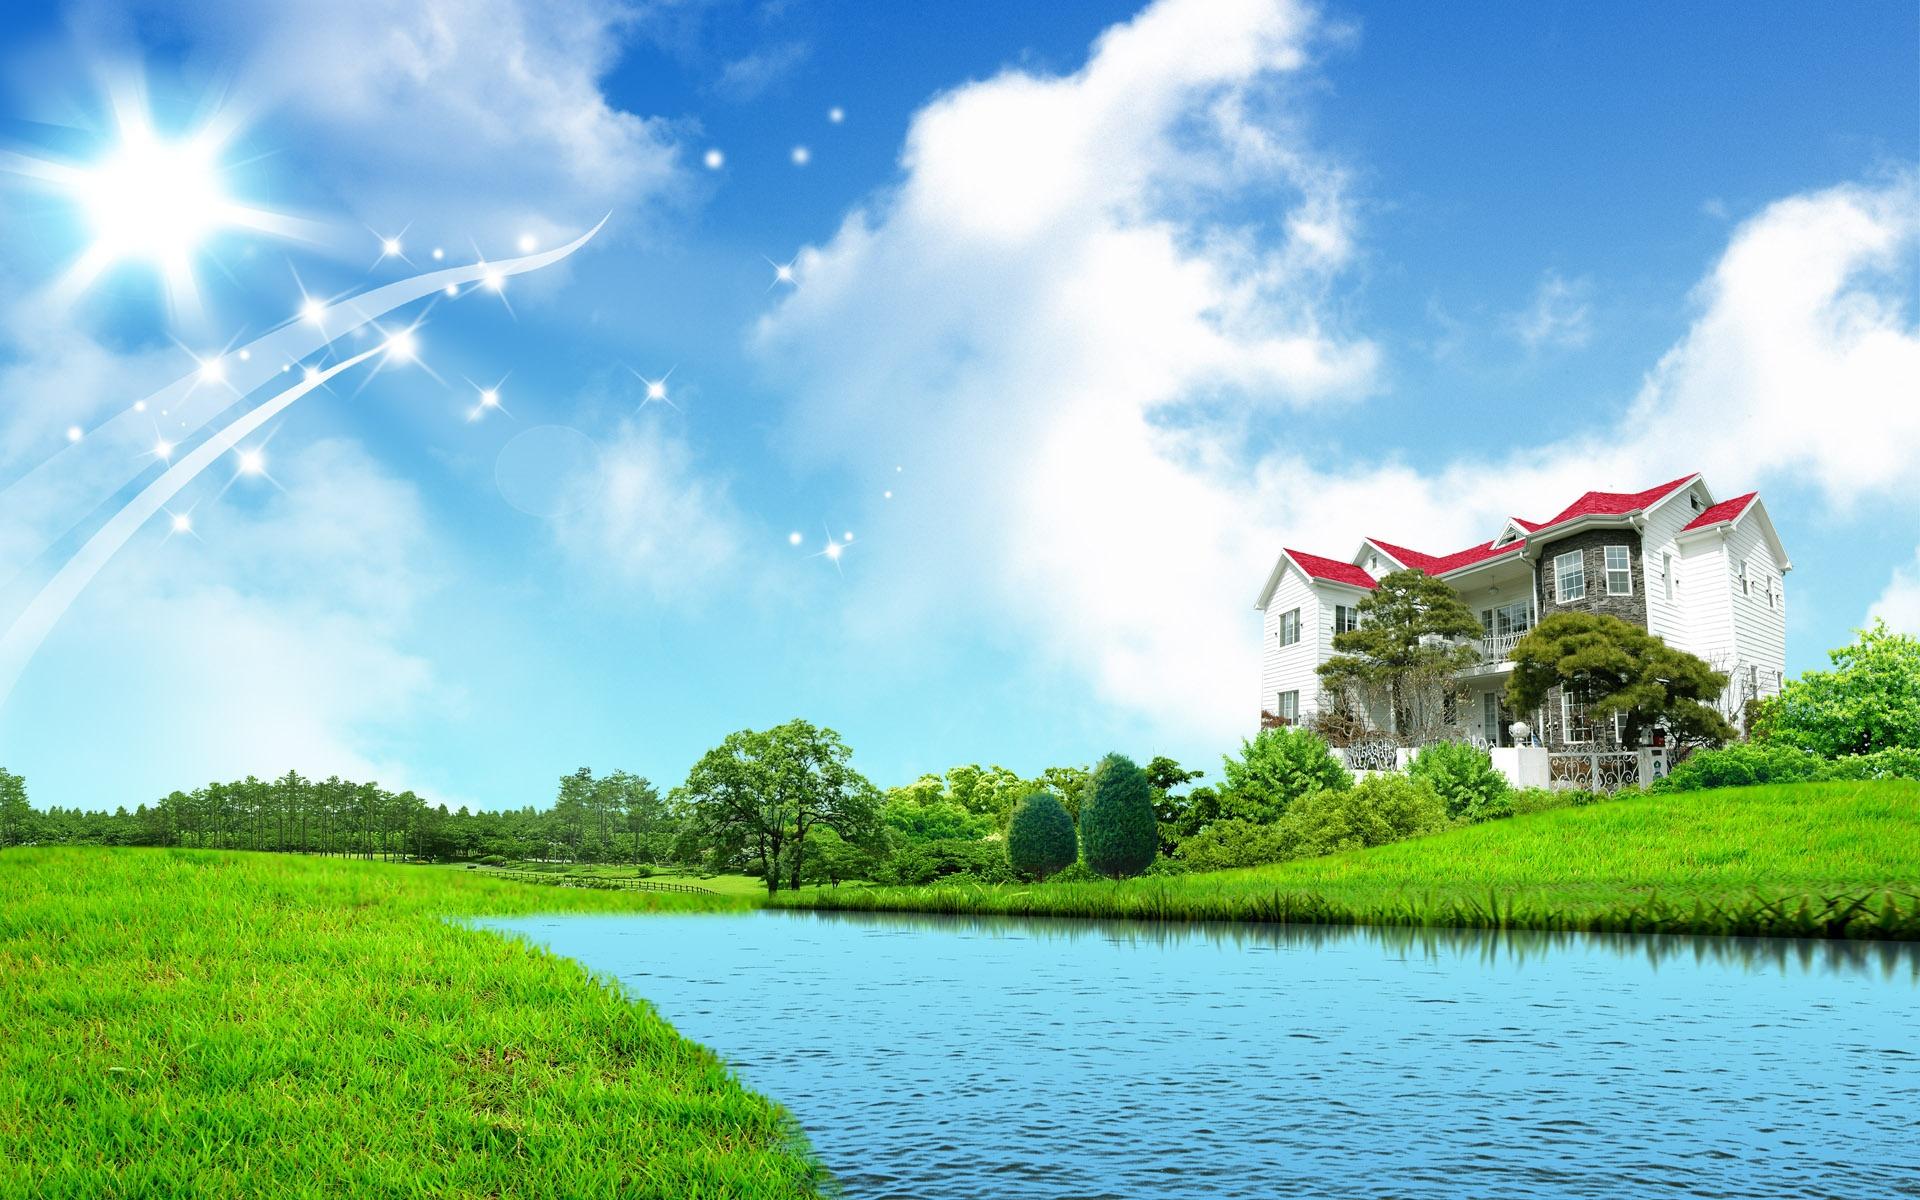 Картинки природа для фона дома